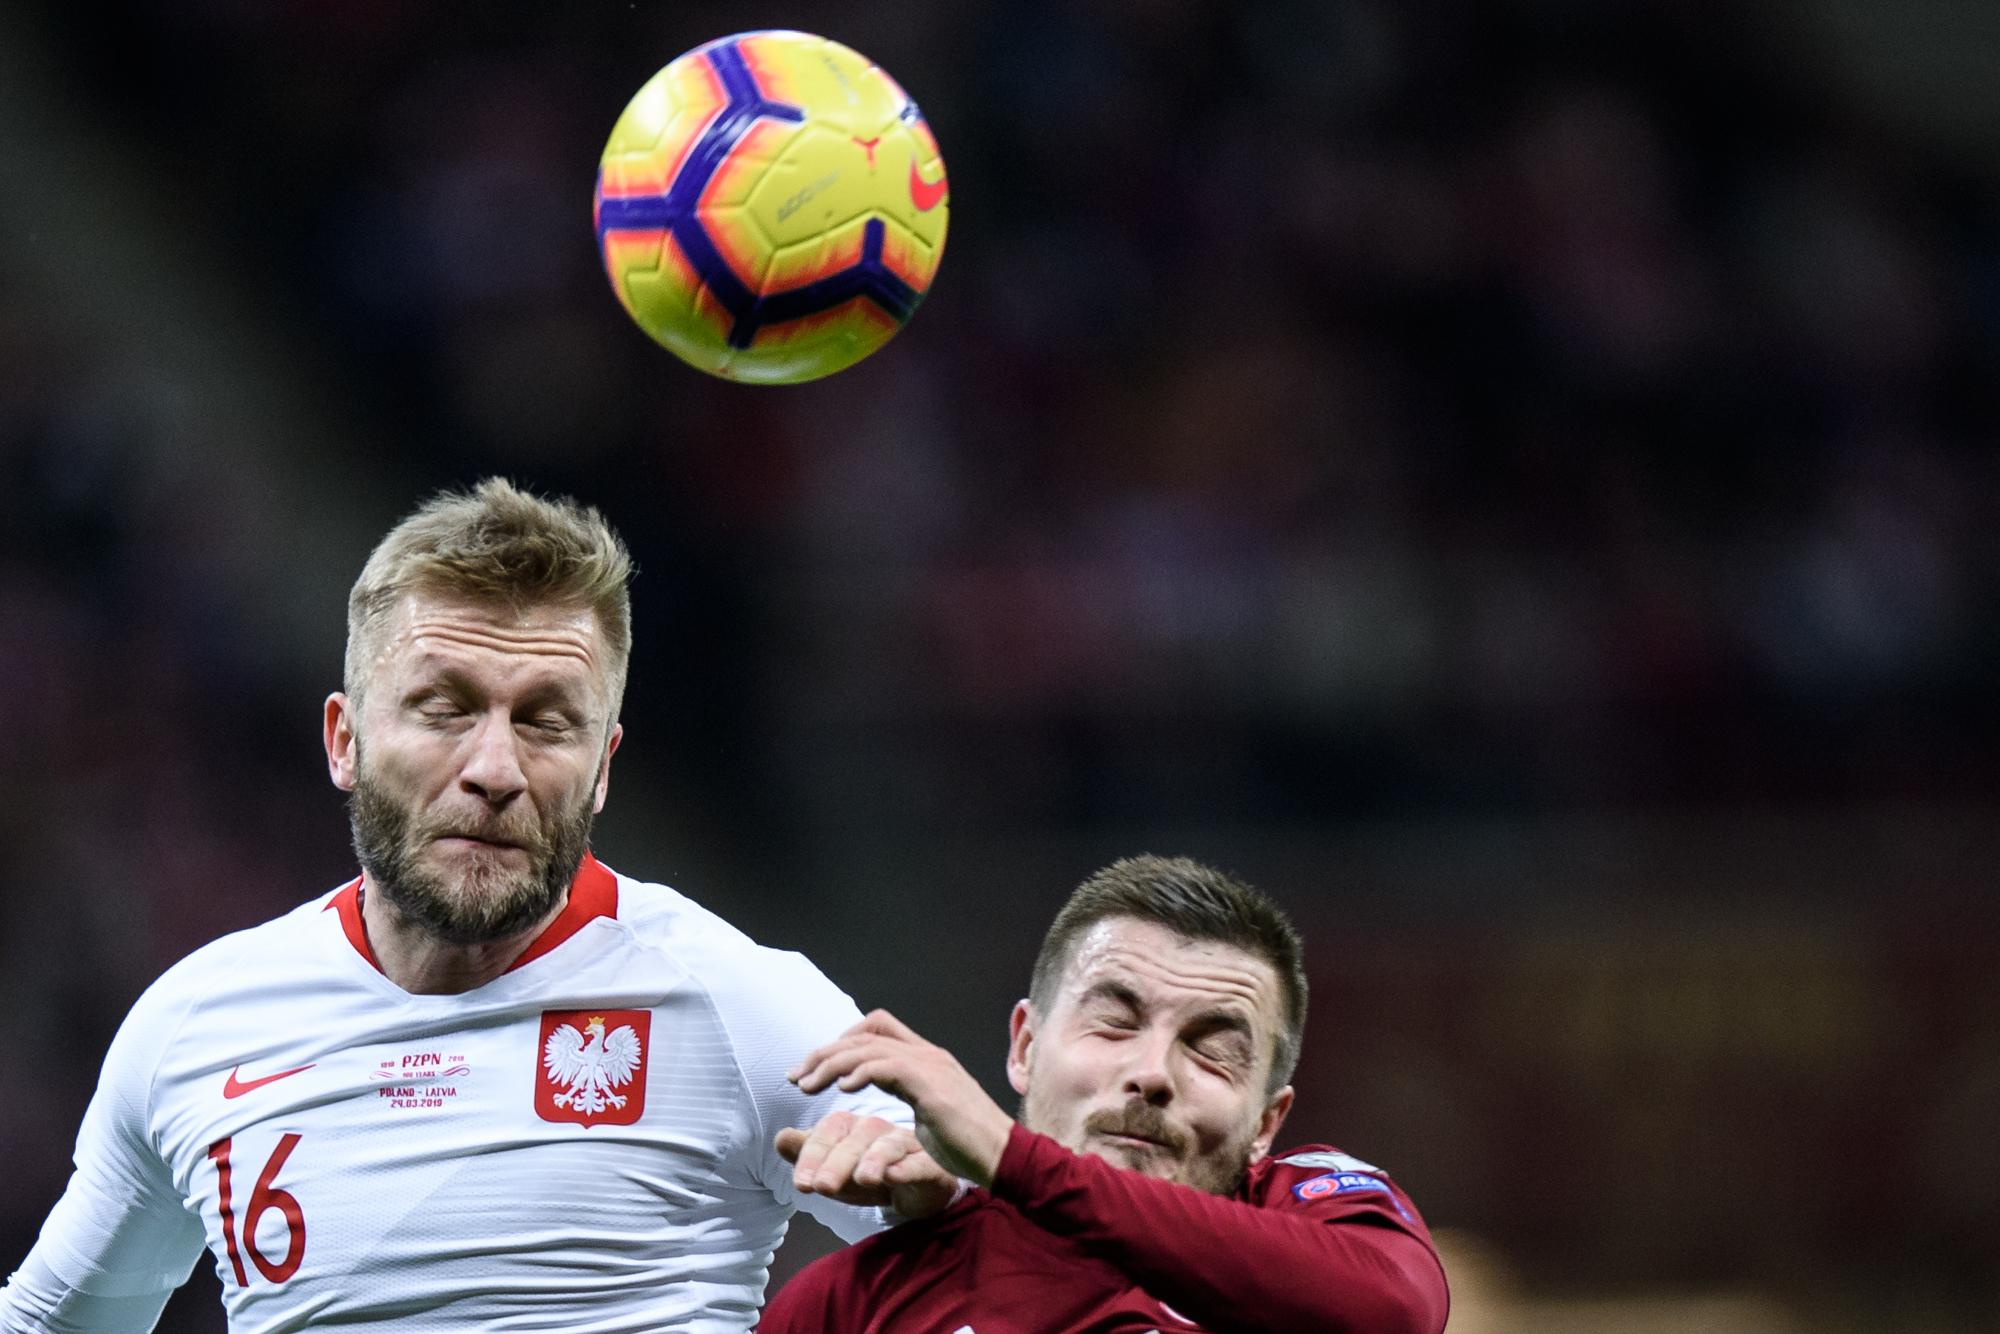 Mecz Polska - Lotwa